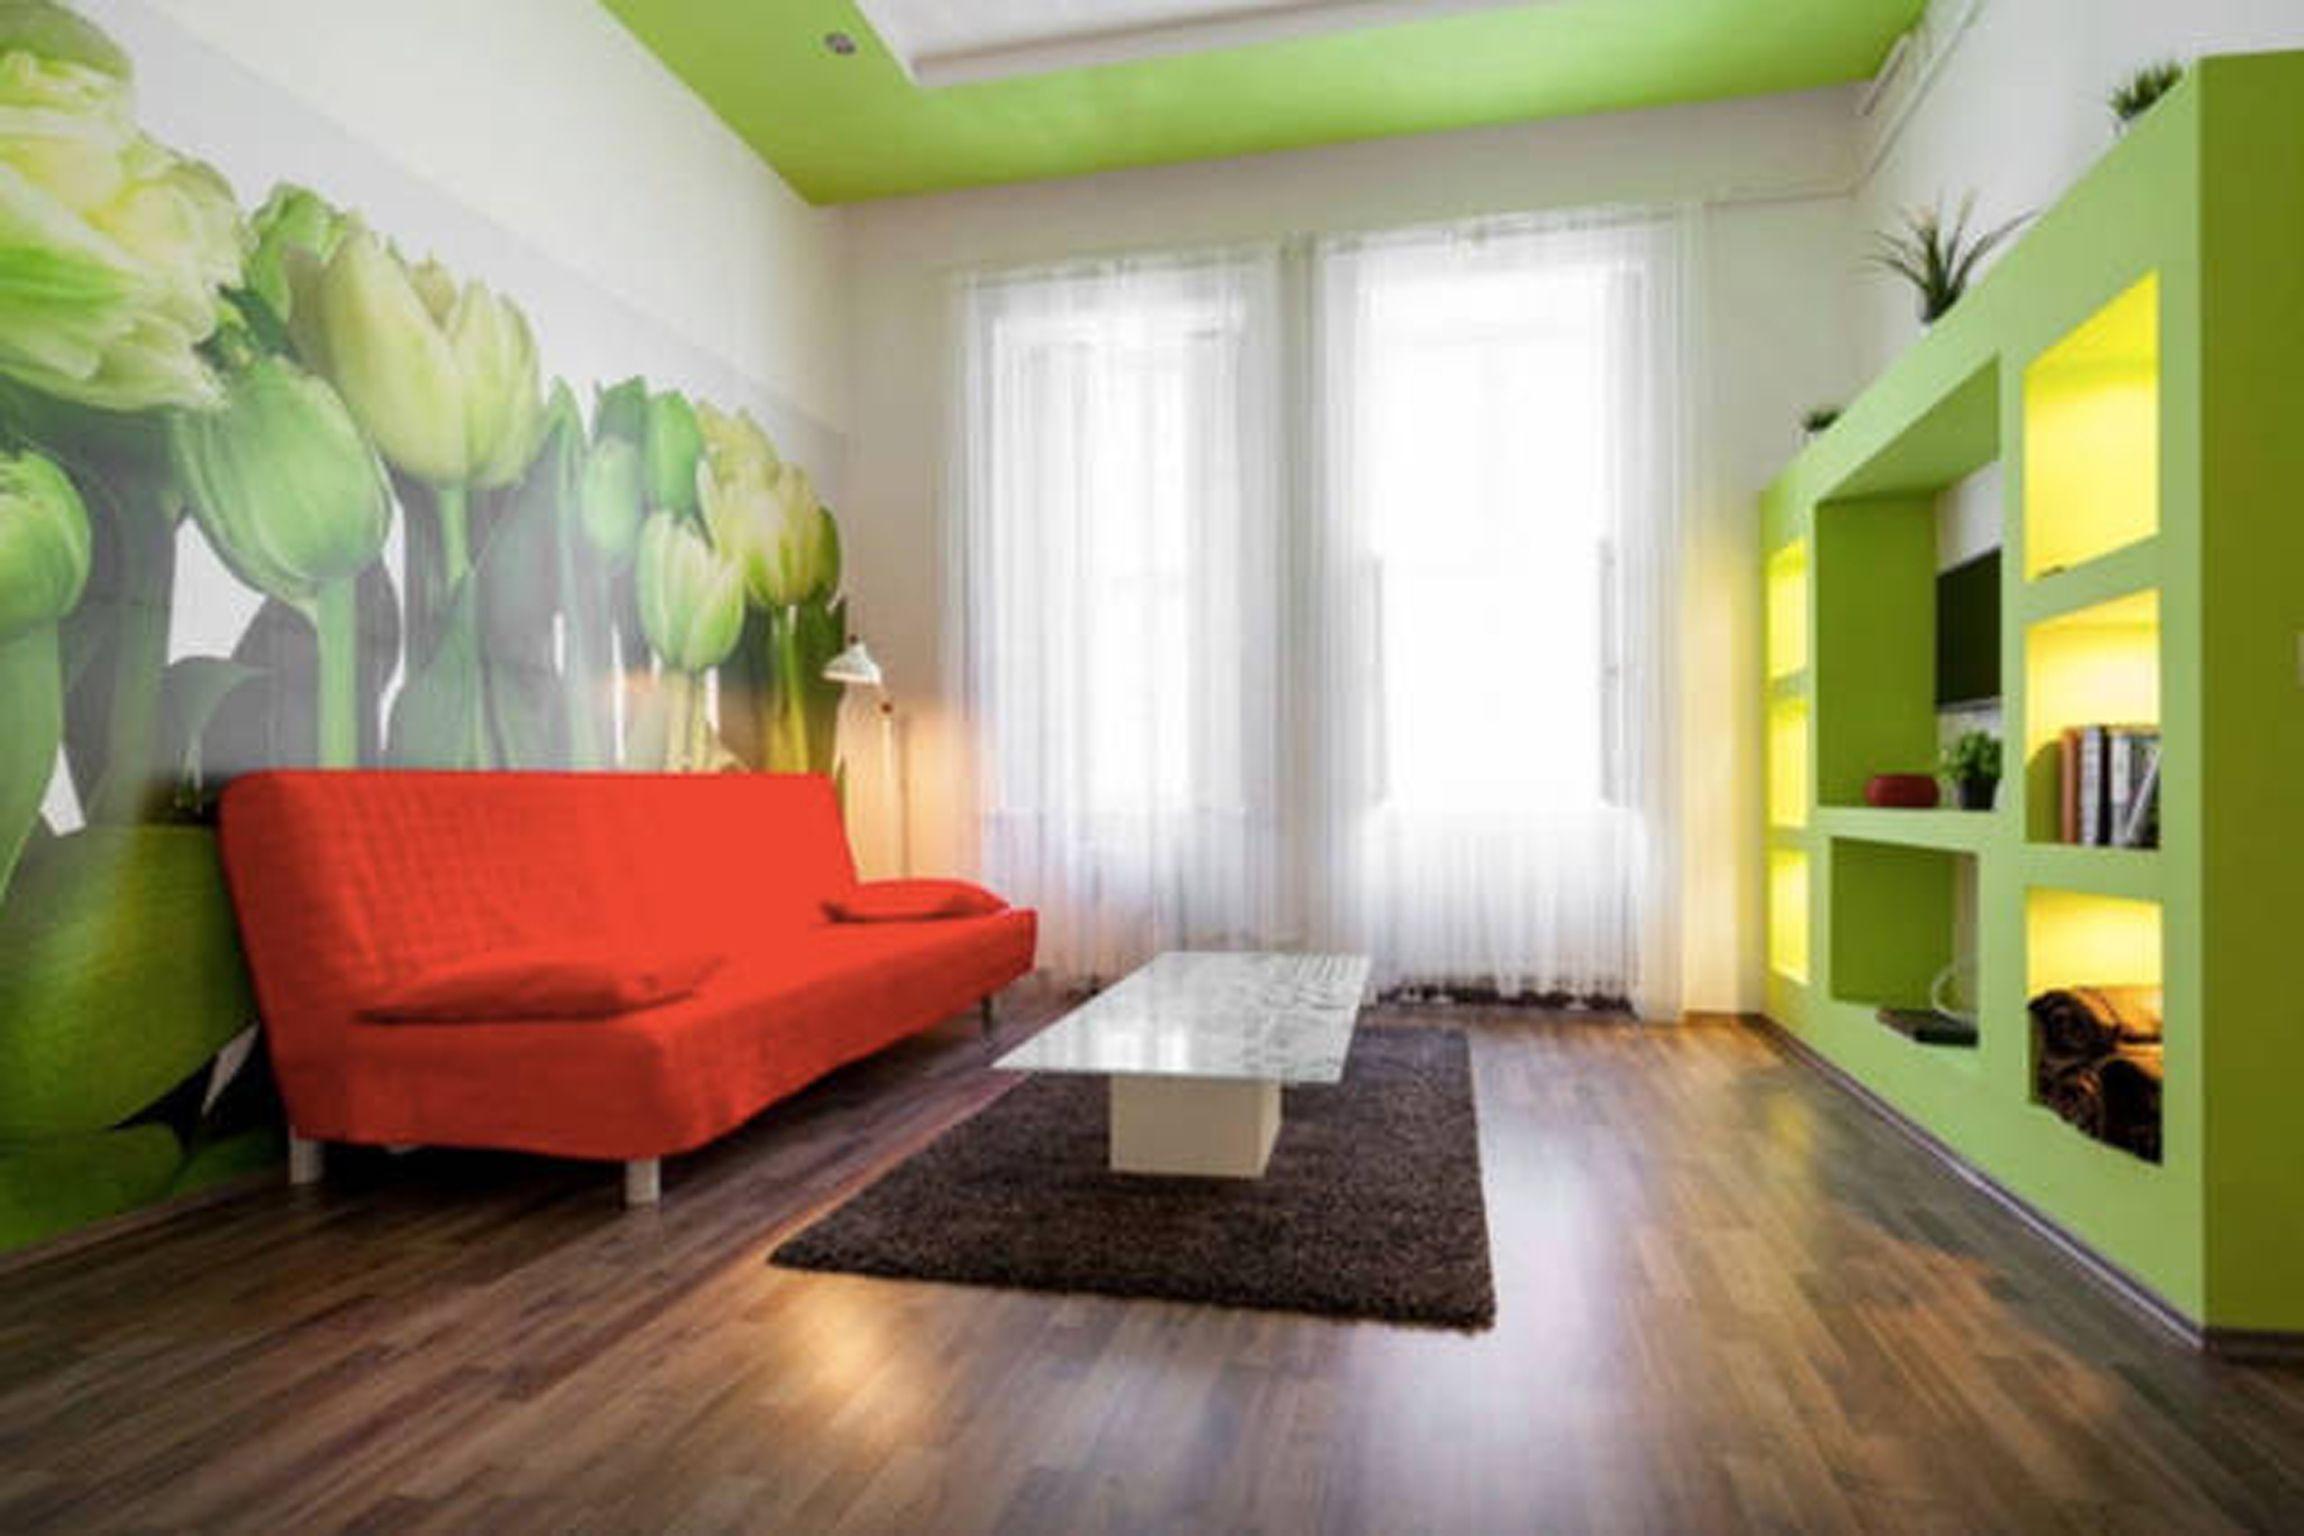 Budget Apartment By Hi5 - KirÁly 99.